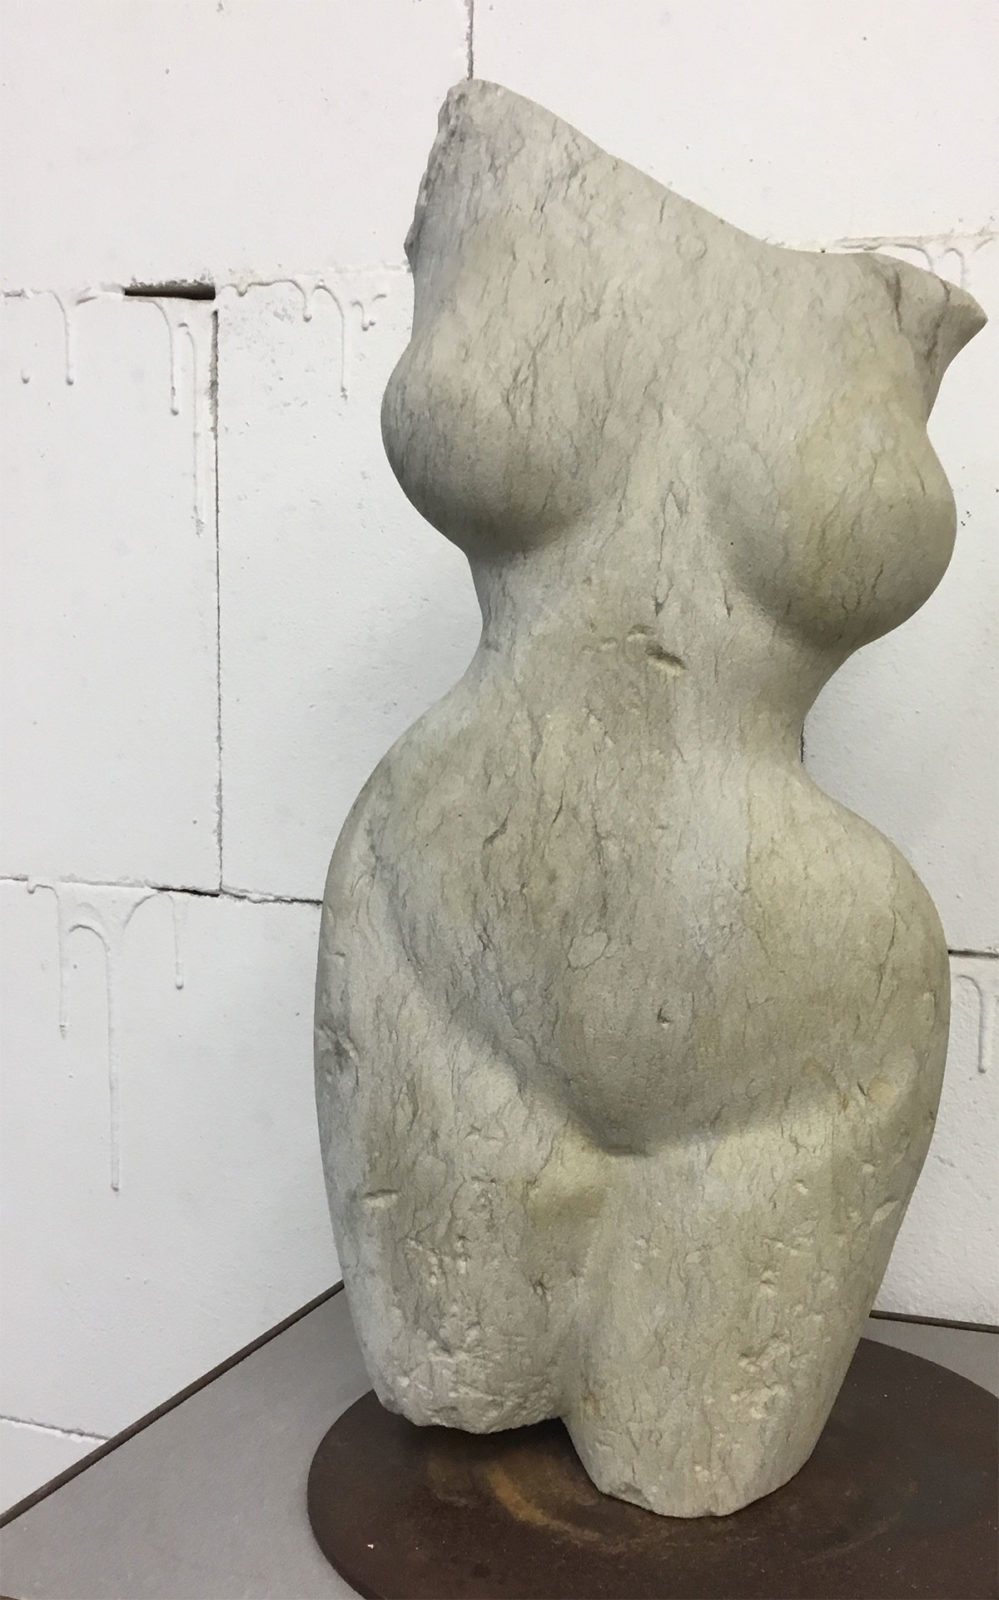 ROSMARIE HACKMANN - ART15 KÜNSTLERHAUS DAPHNE ROSMARIE